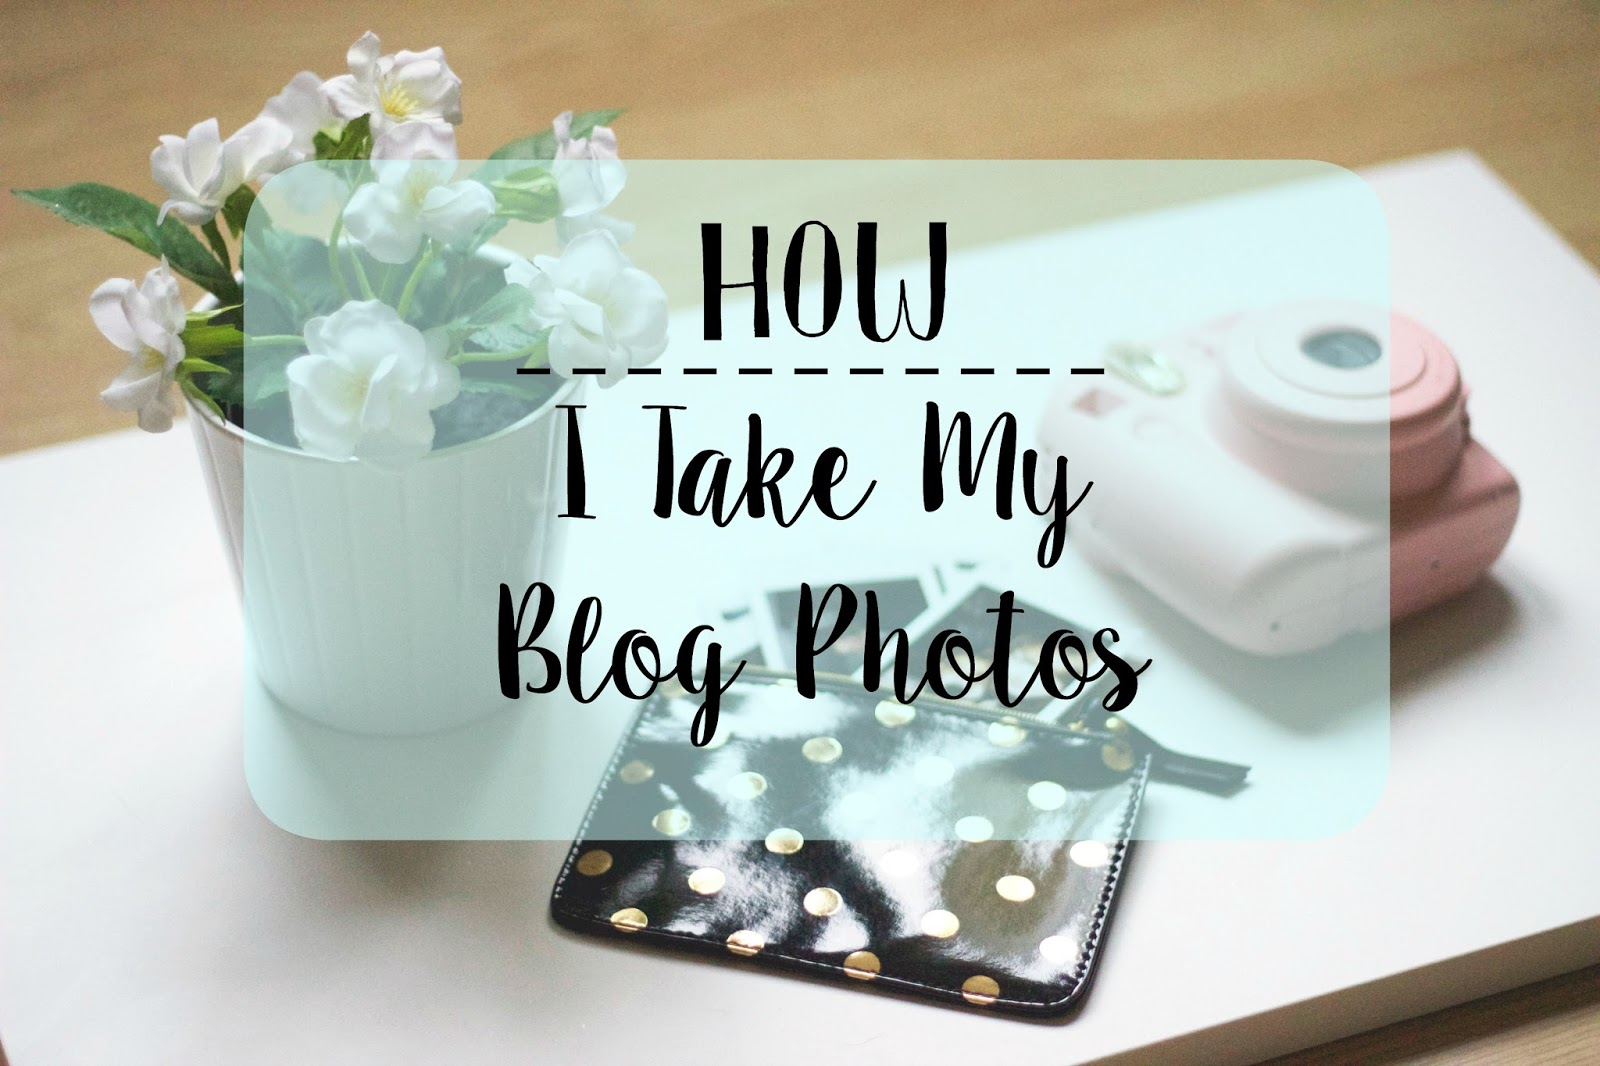 How I Take My Blog Photos